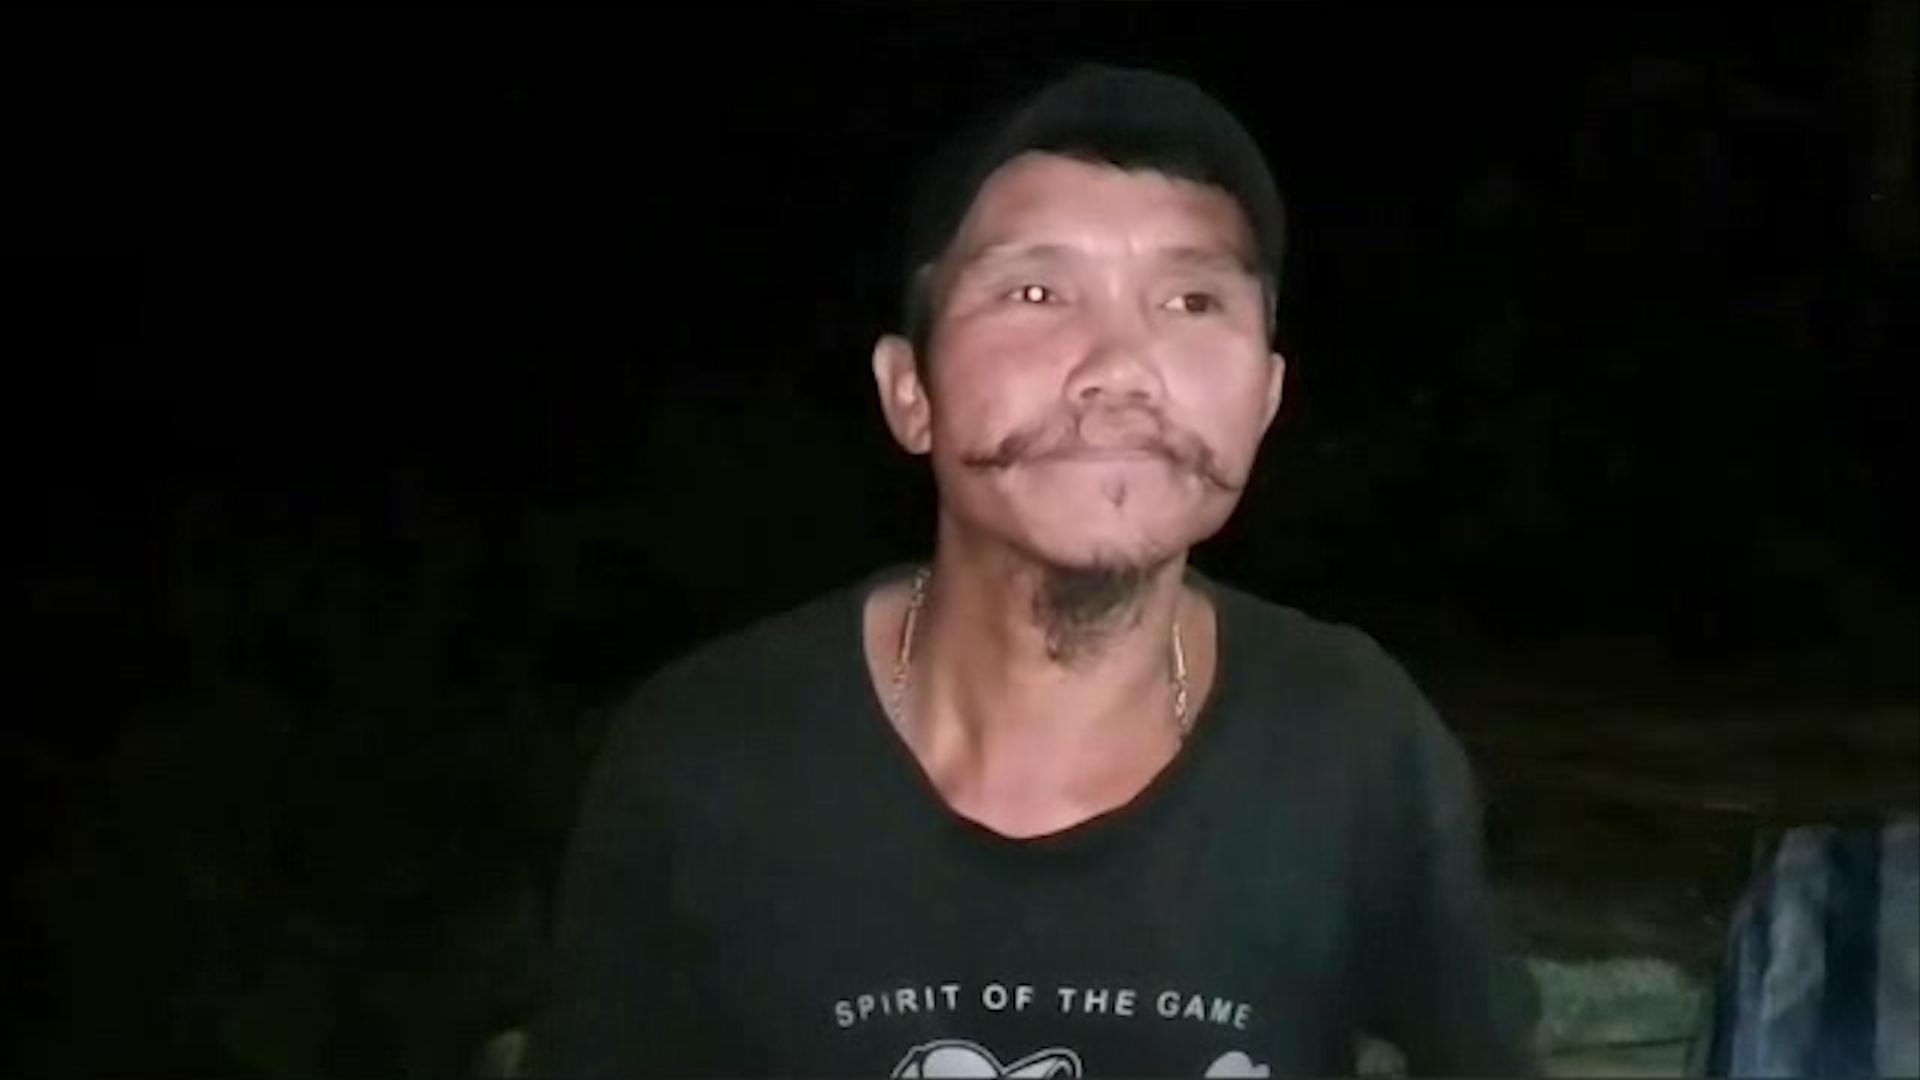 Dogilike.com :: สุดซึ้ง หนุ่มวัย 40 เดินเท้าพร้อมเถ้ากระดูกคนรักและน้องหมา 3 ตัว ออกเดินทางทั่วไทย